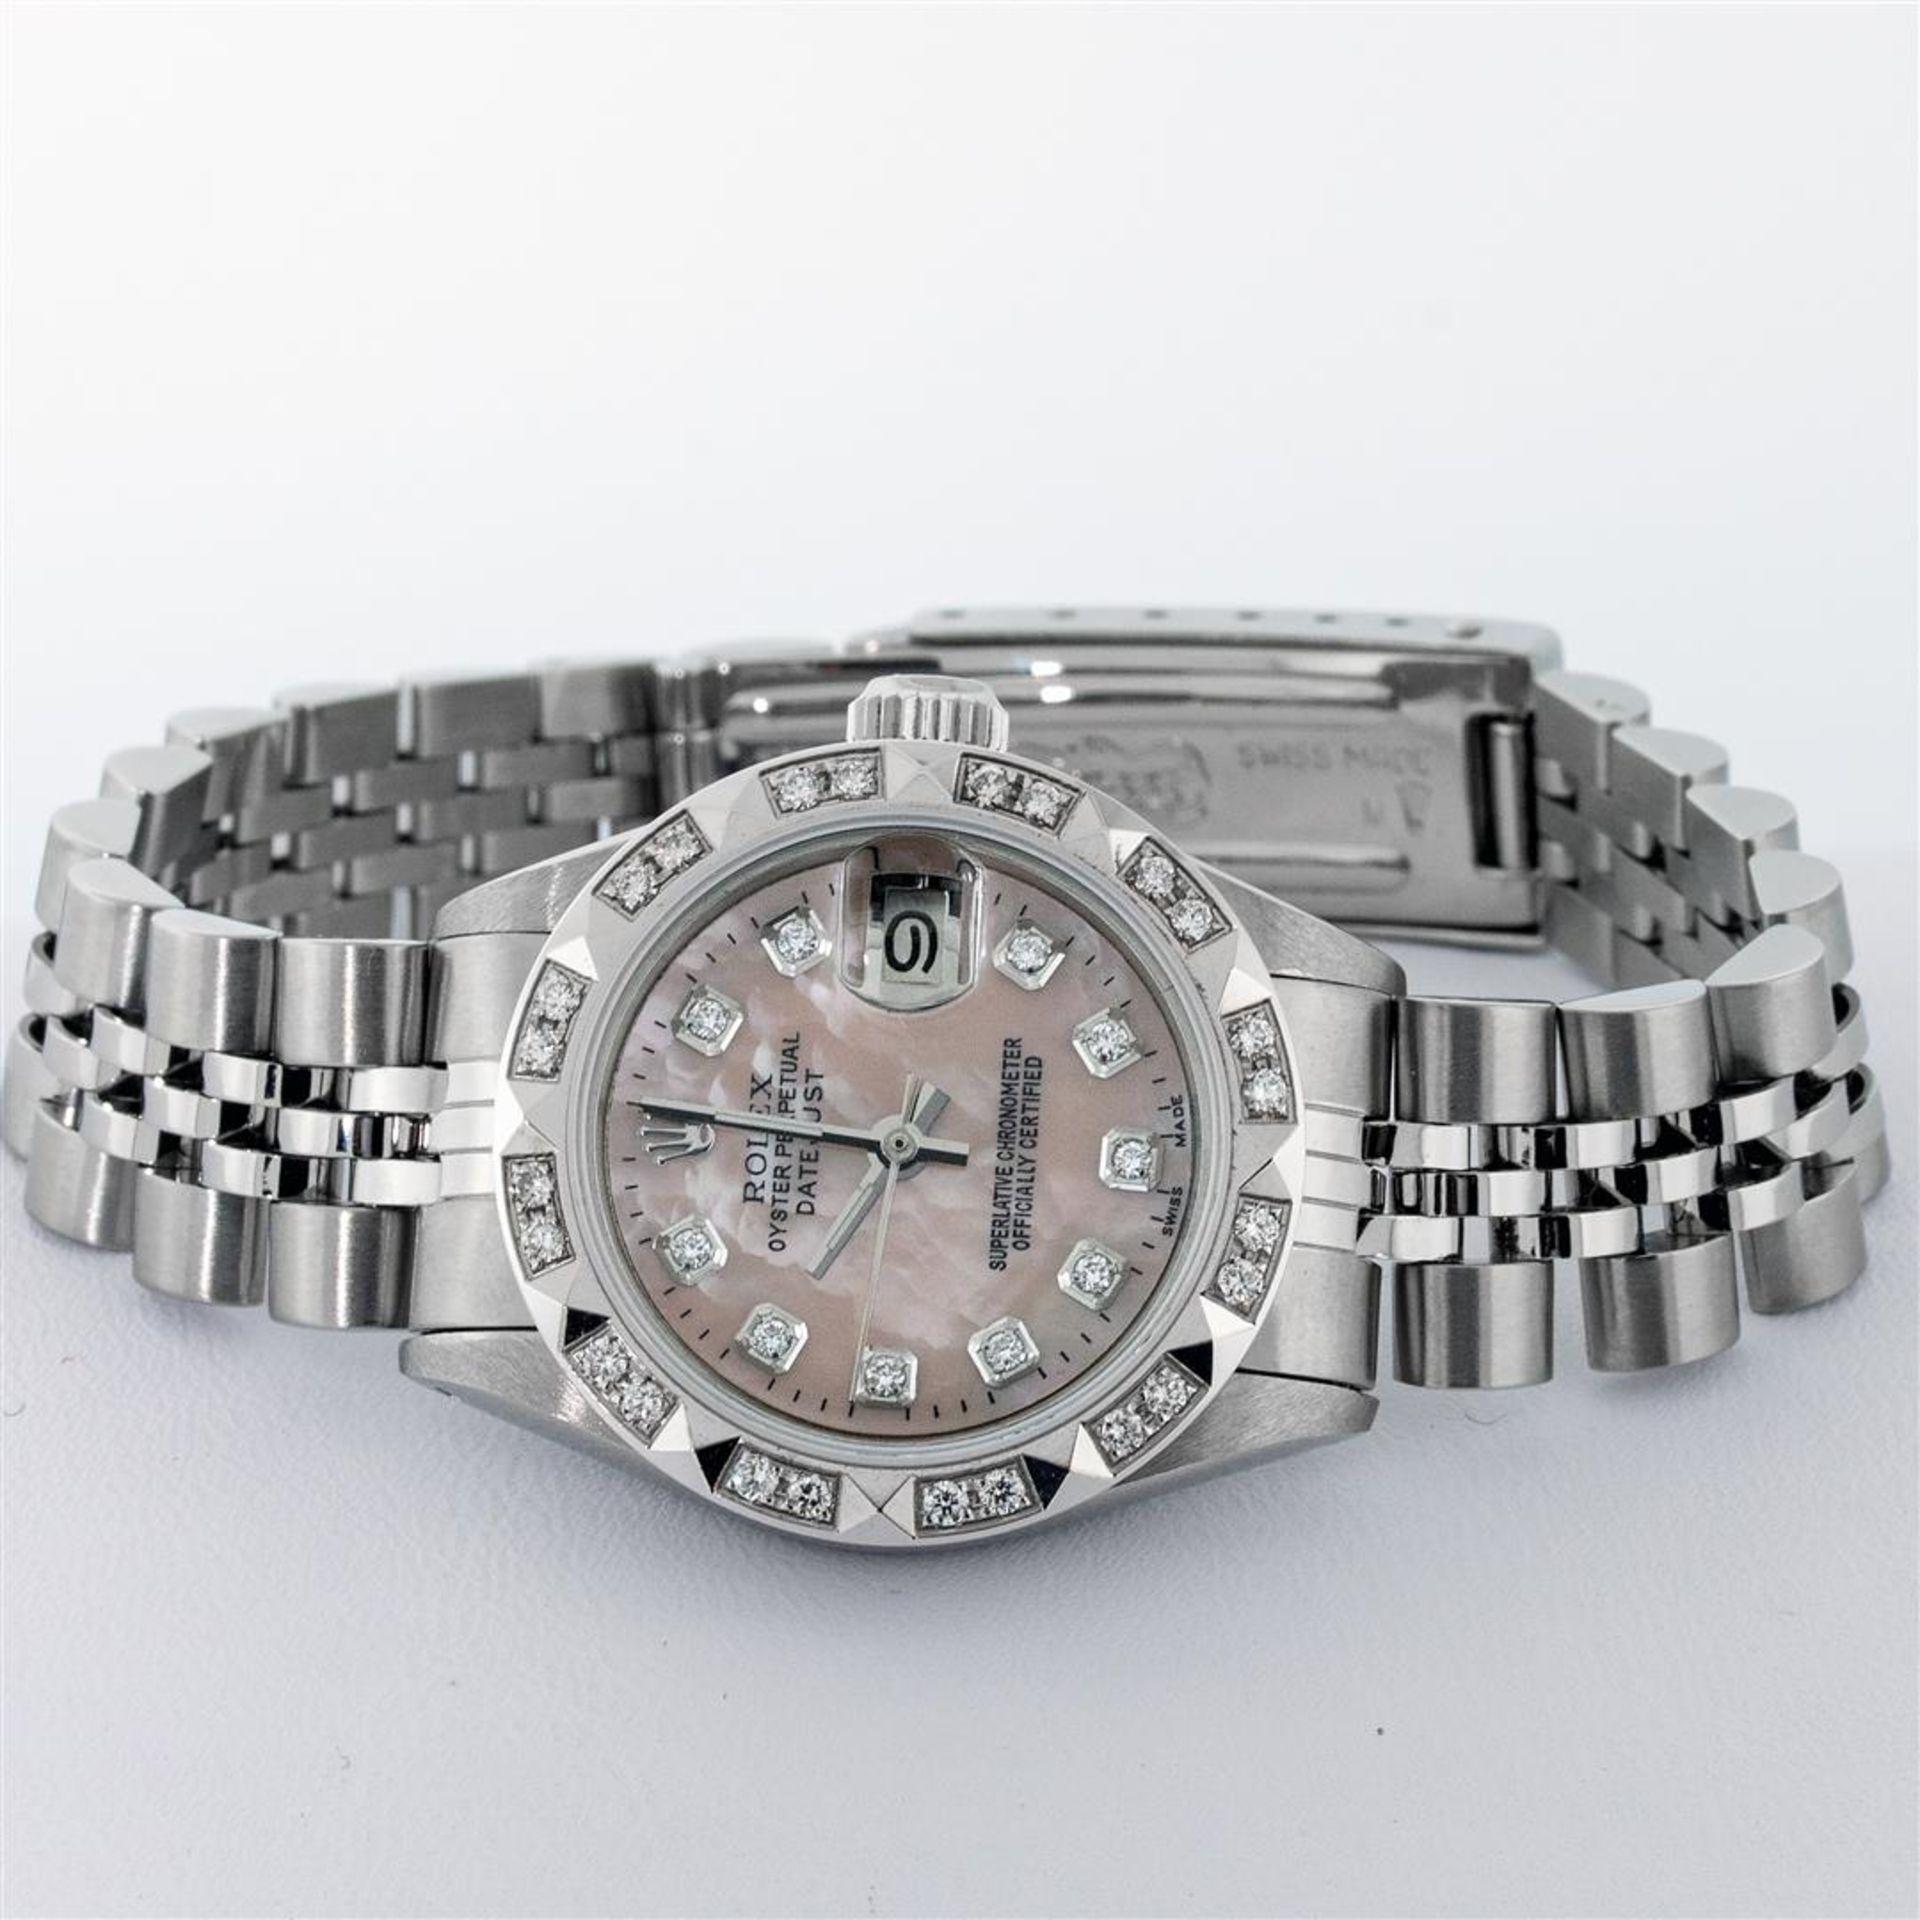 Rolex Ladies Stainless Steel Pink MOP Pyramid Diamond Datejust Wristwatch 26MM - Image 3 of 9